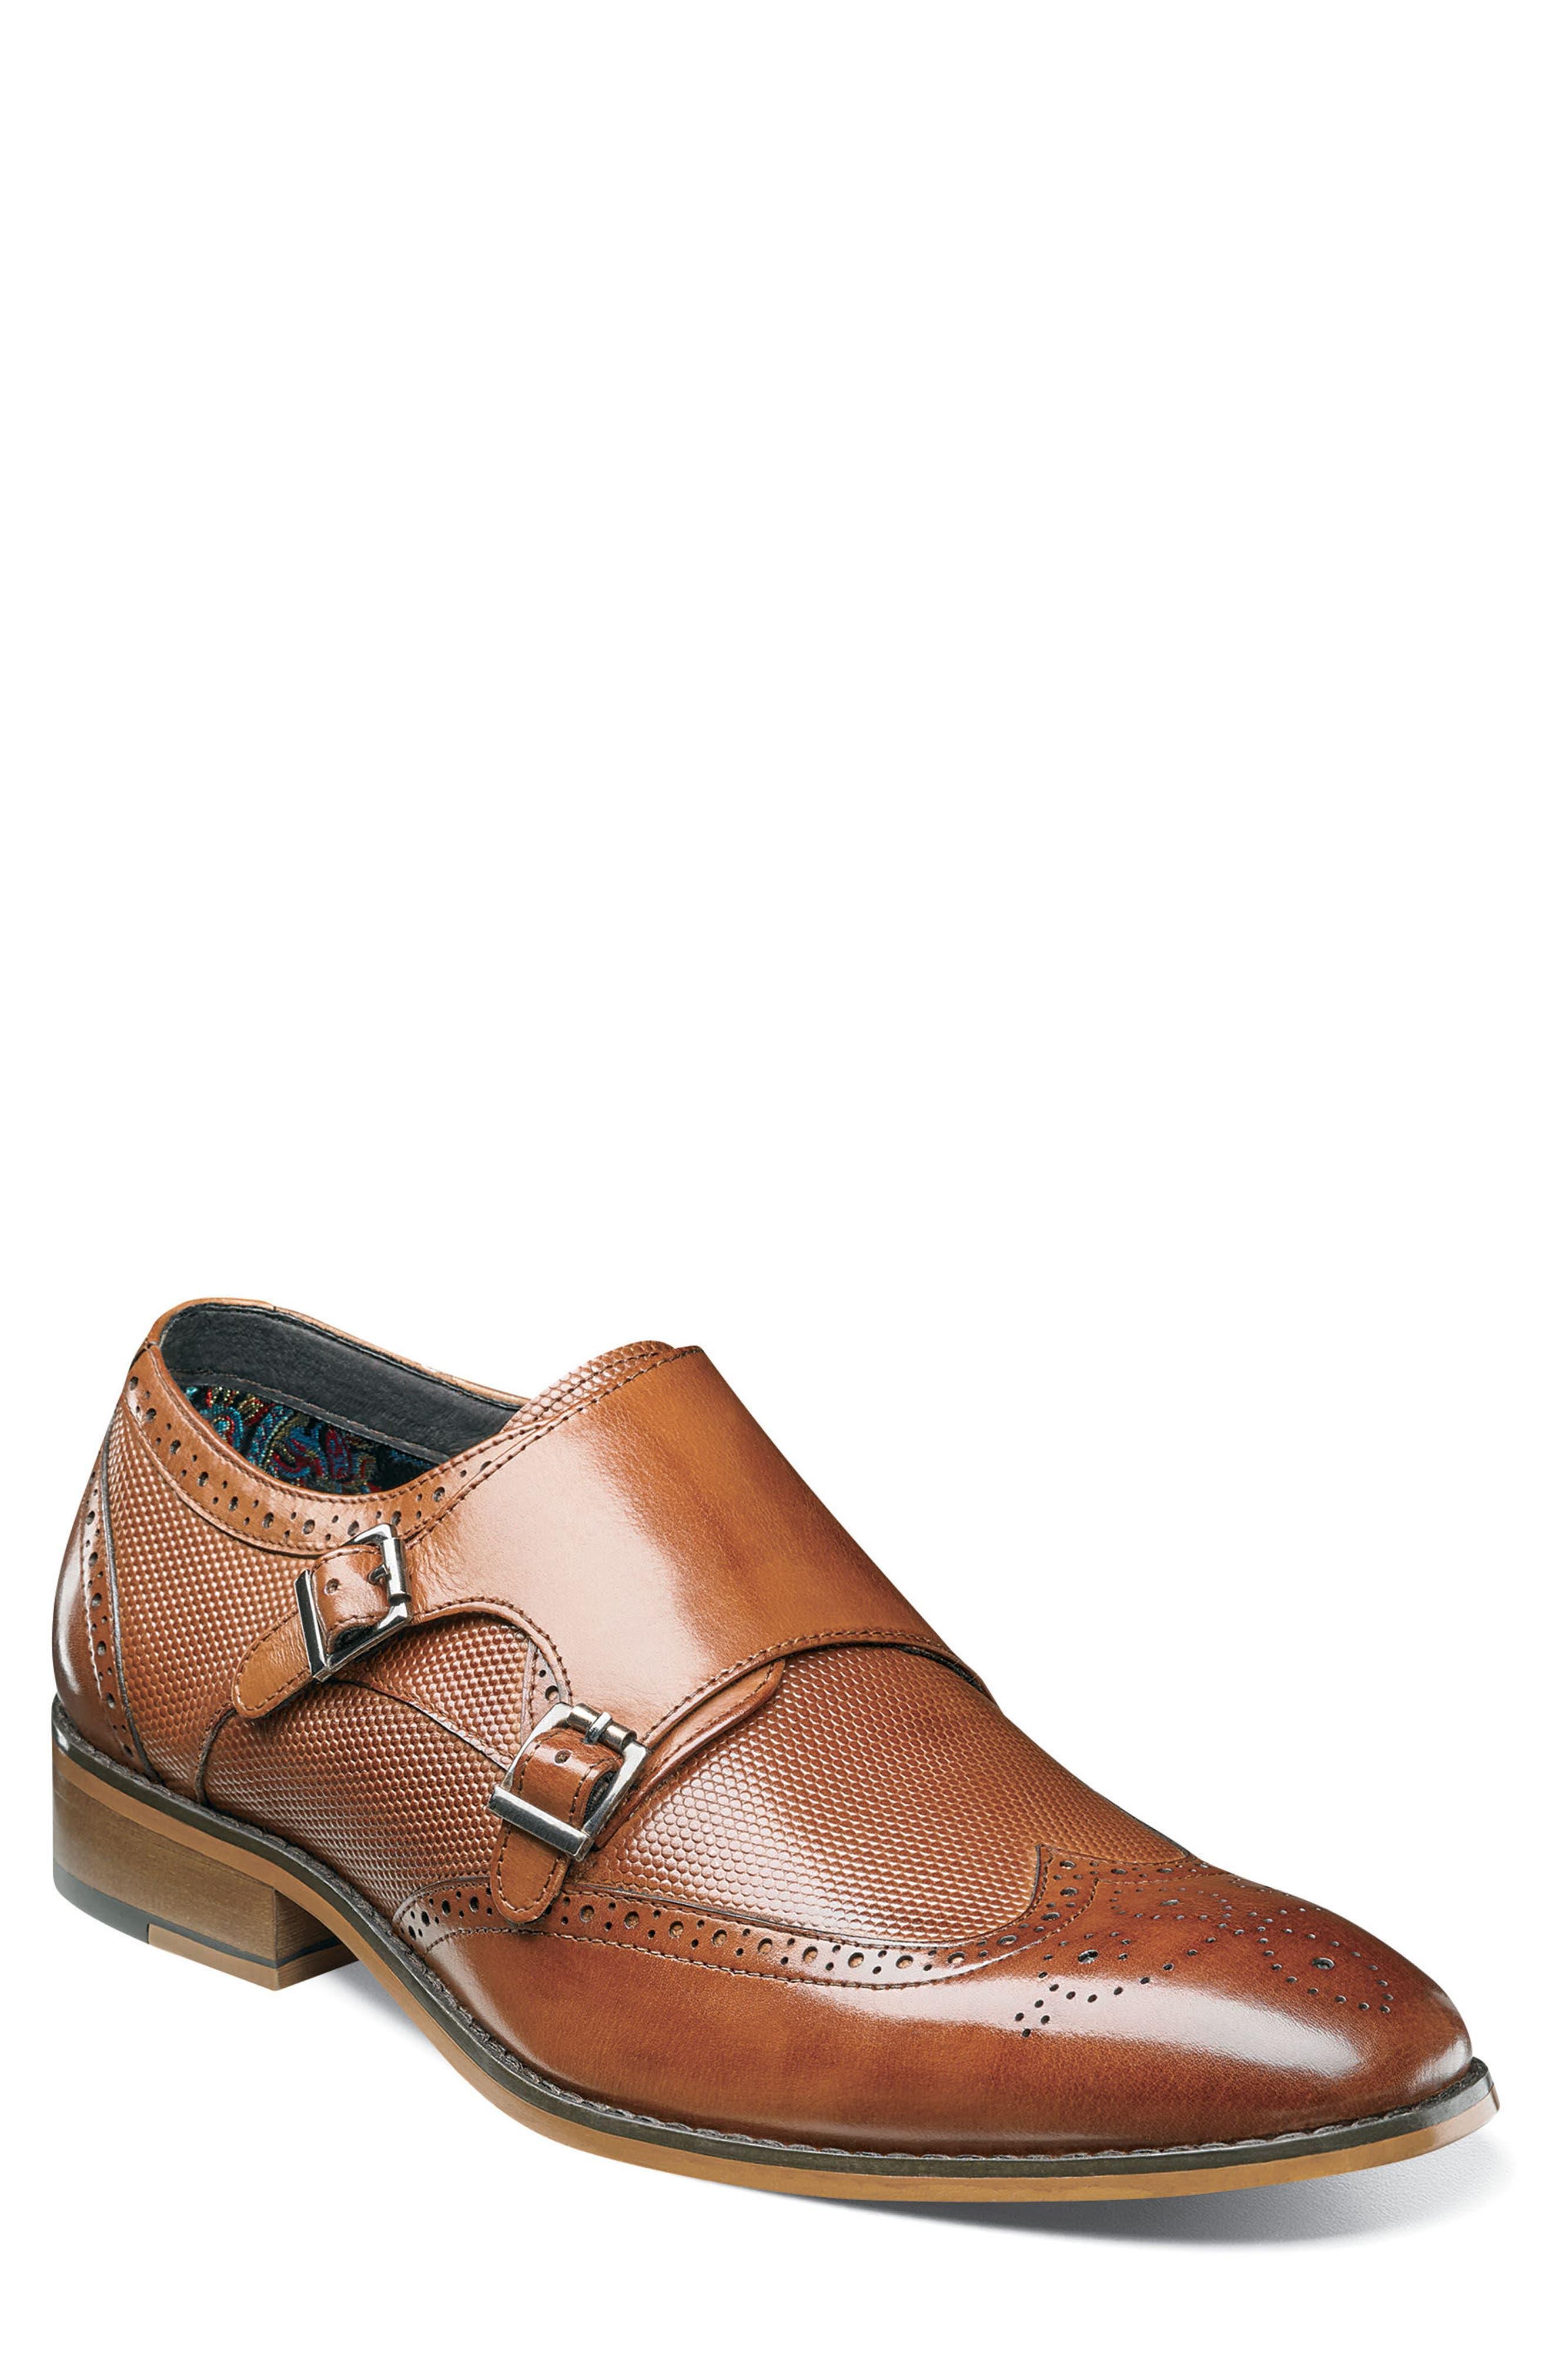 Lavine Wingtip Monk Shoe,                         Main,                         color, Saddle Tan Leather